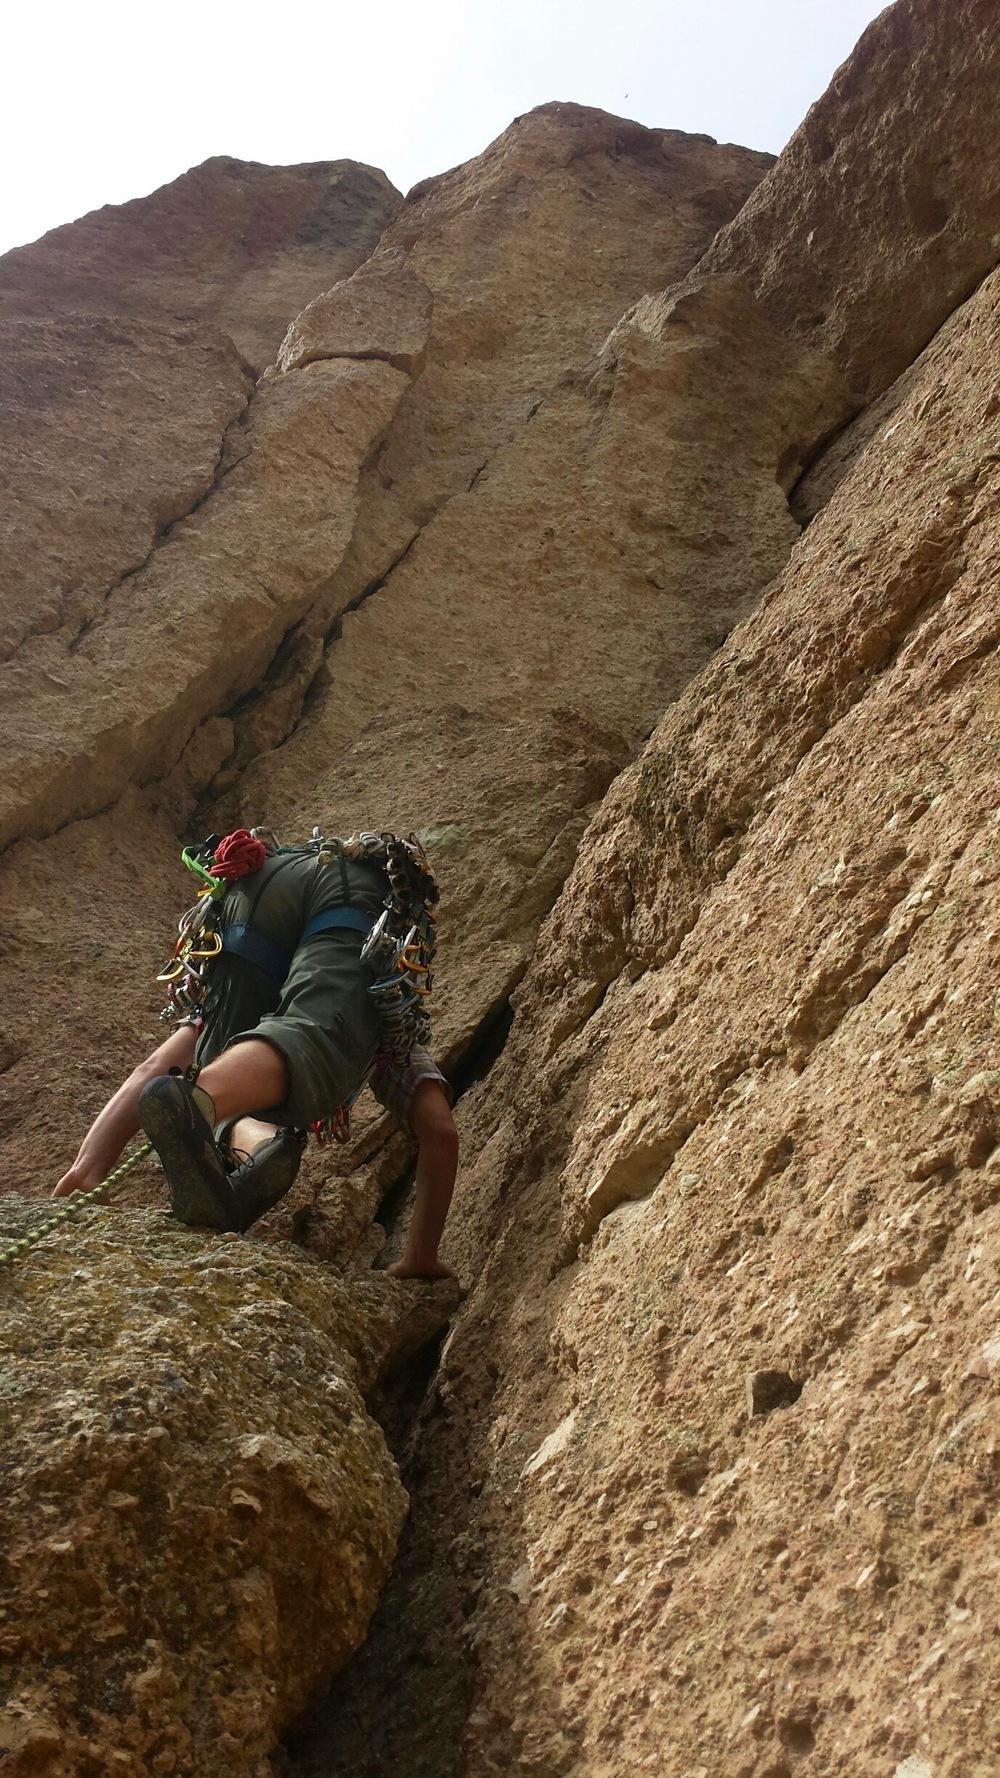 Los Angeles Multi-Pitch Rock Climbing